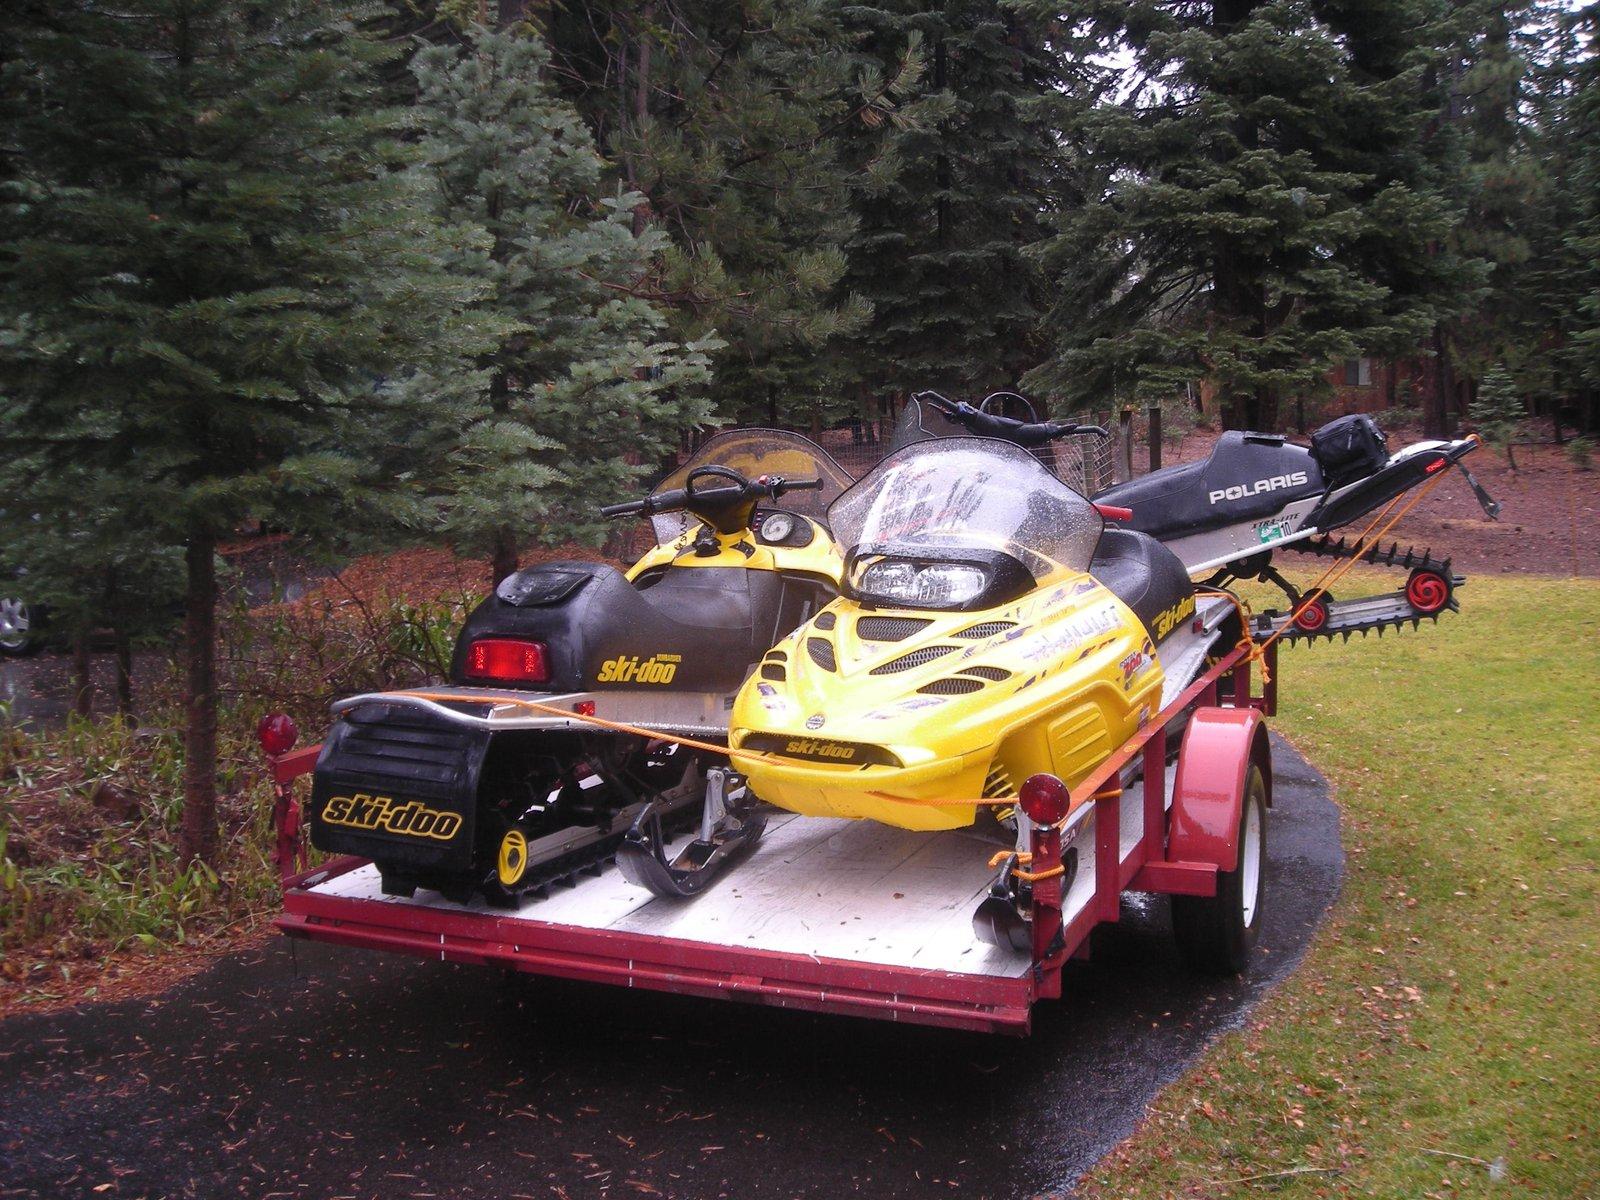 Tfc sleds